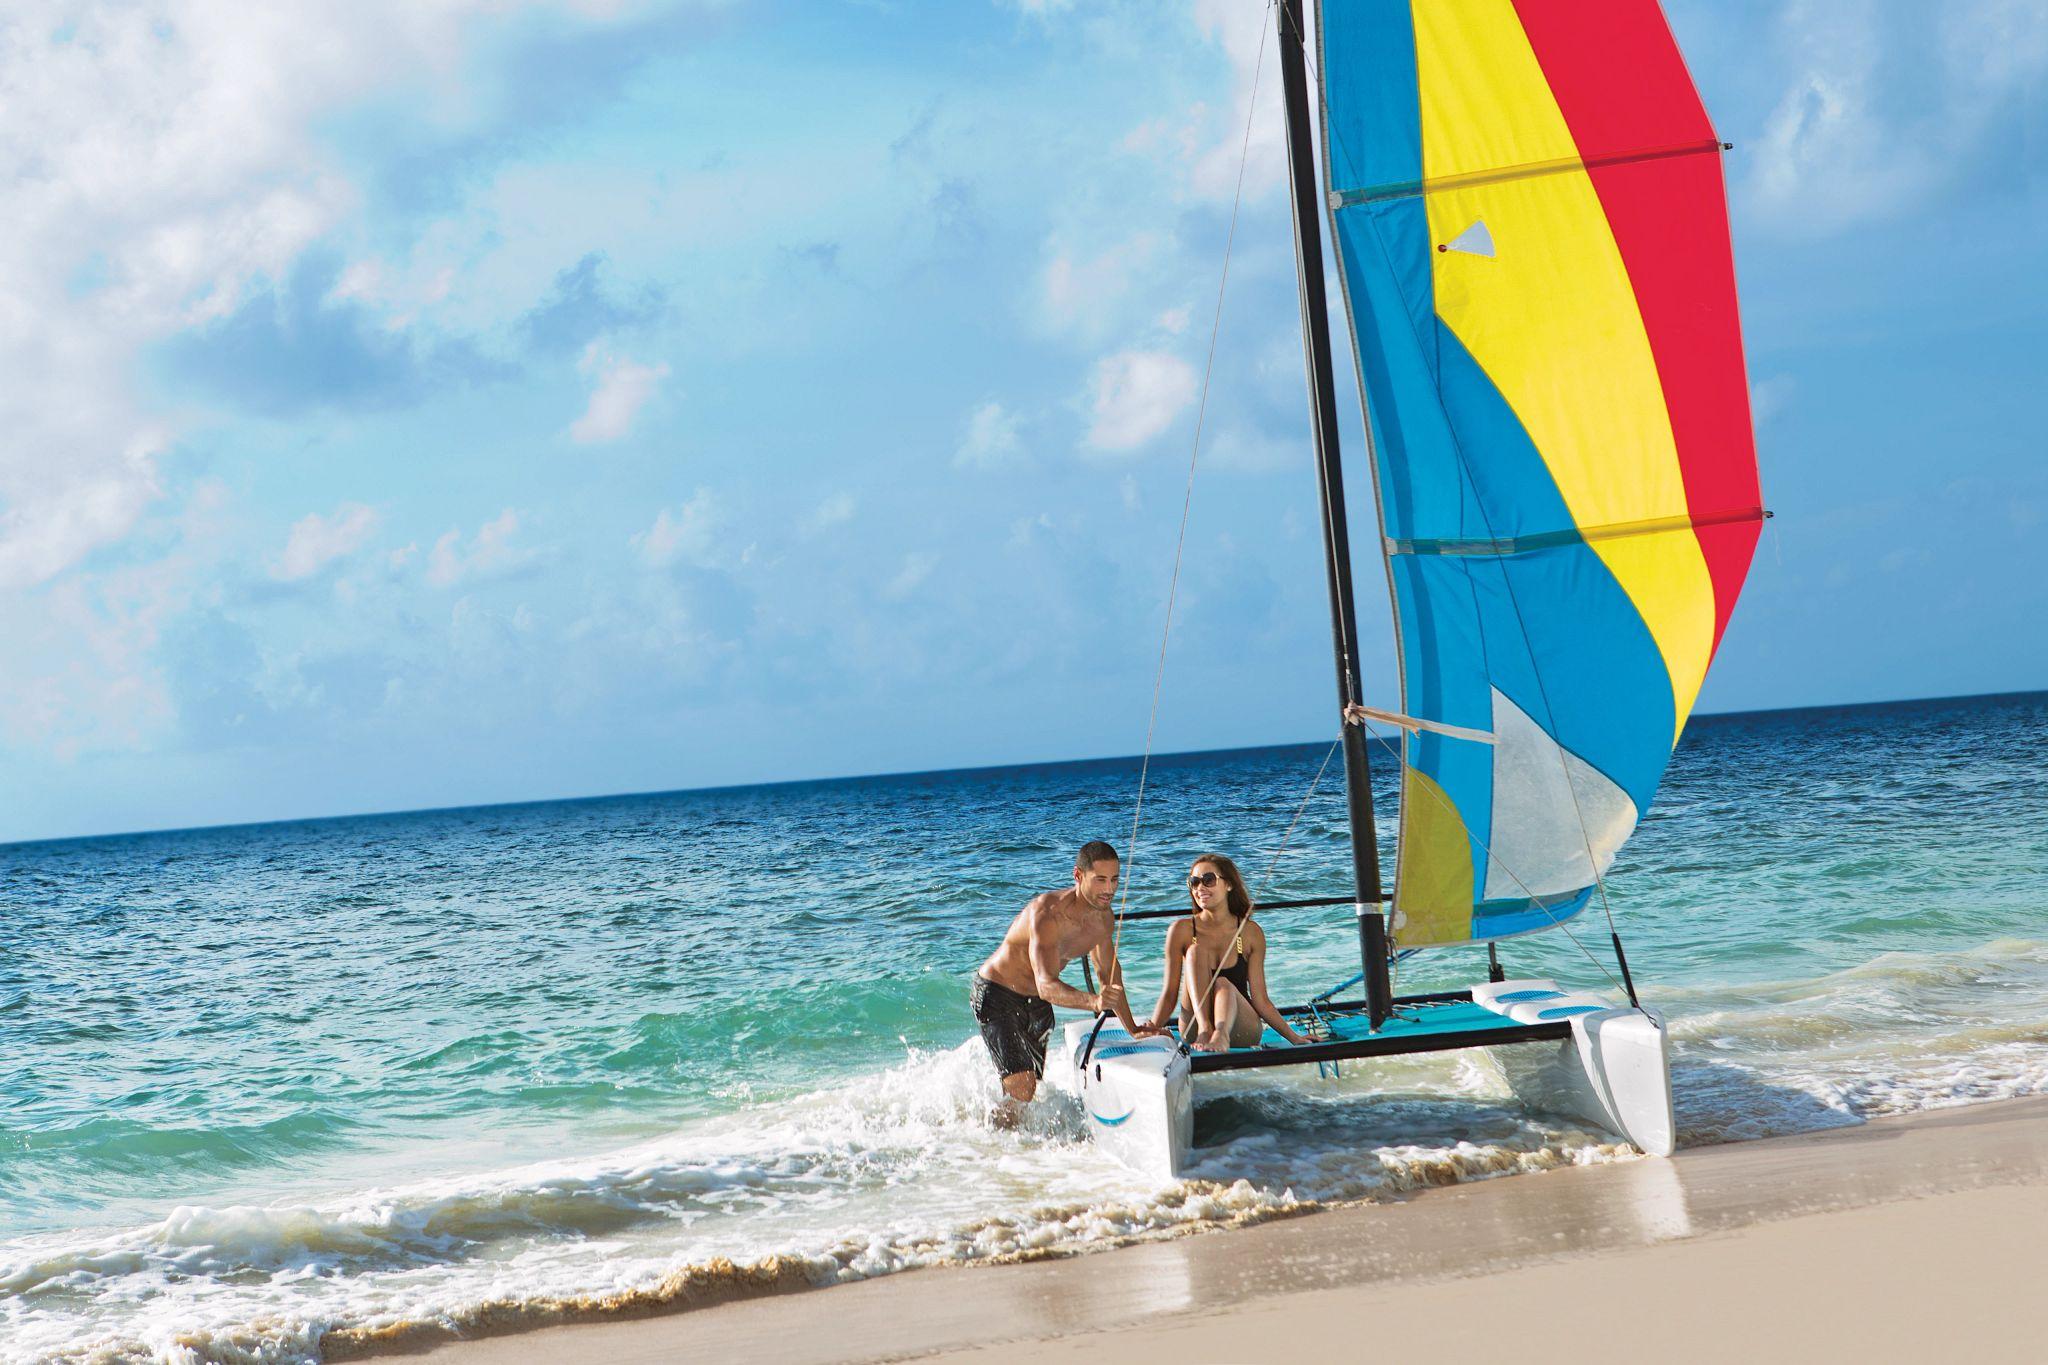 Couple sitting on a catamaran on the beach